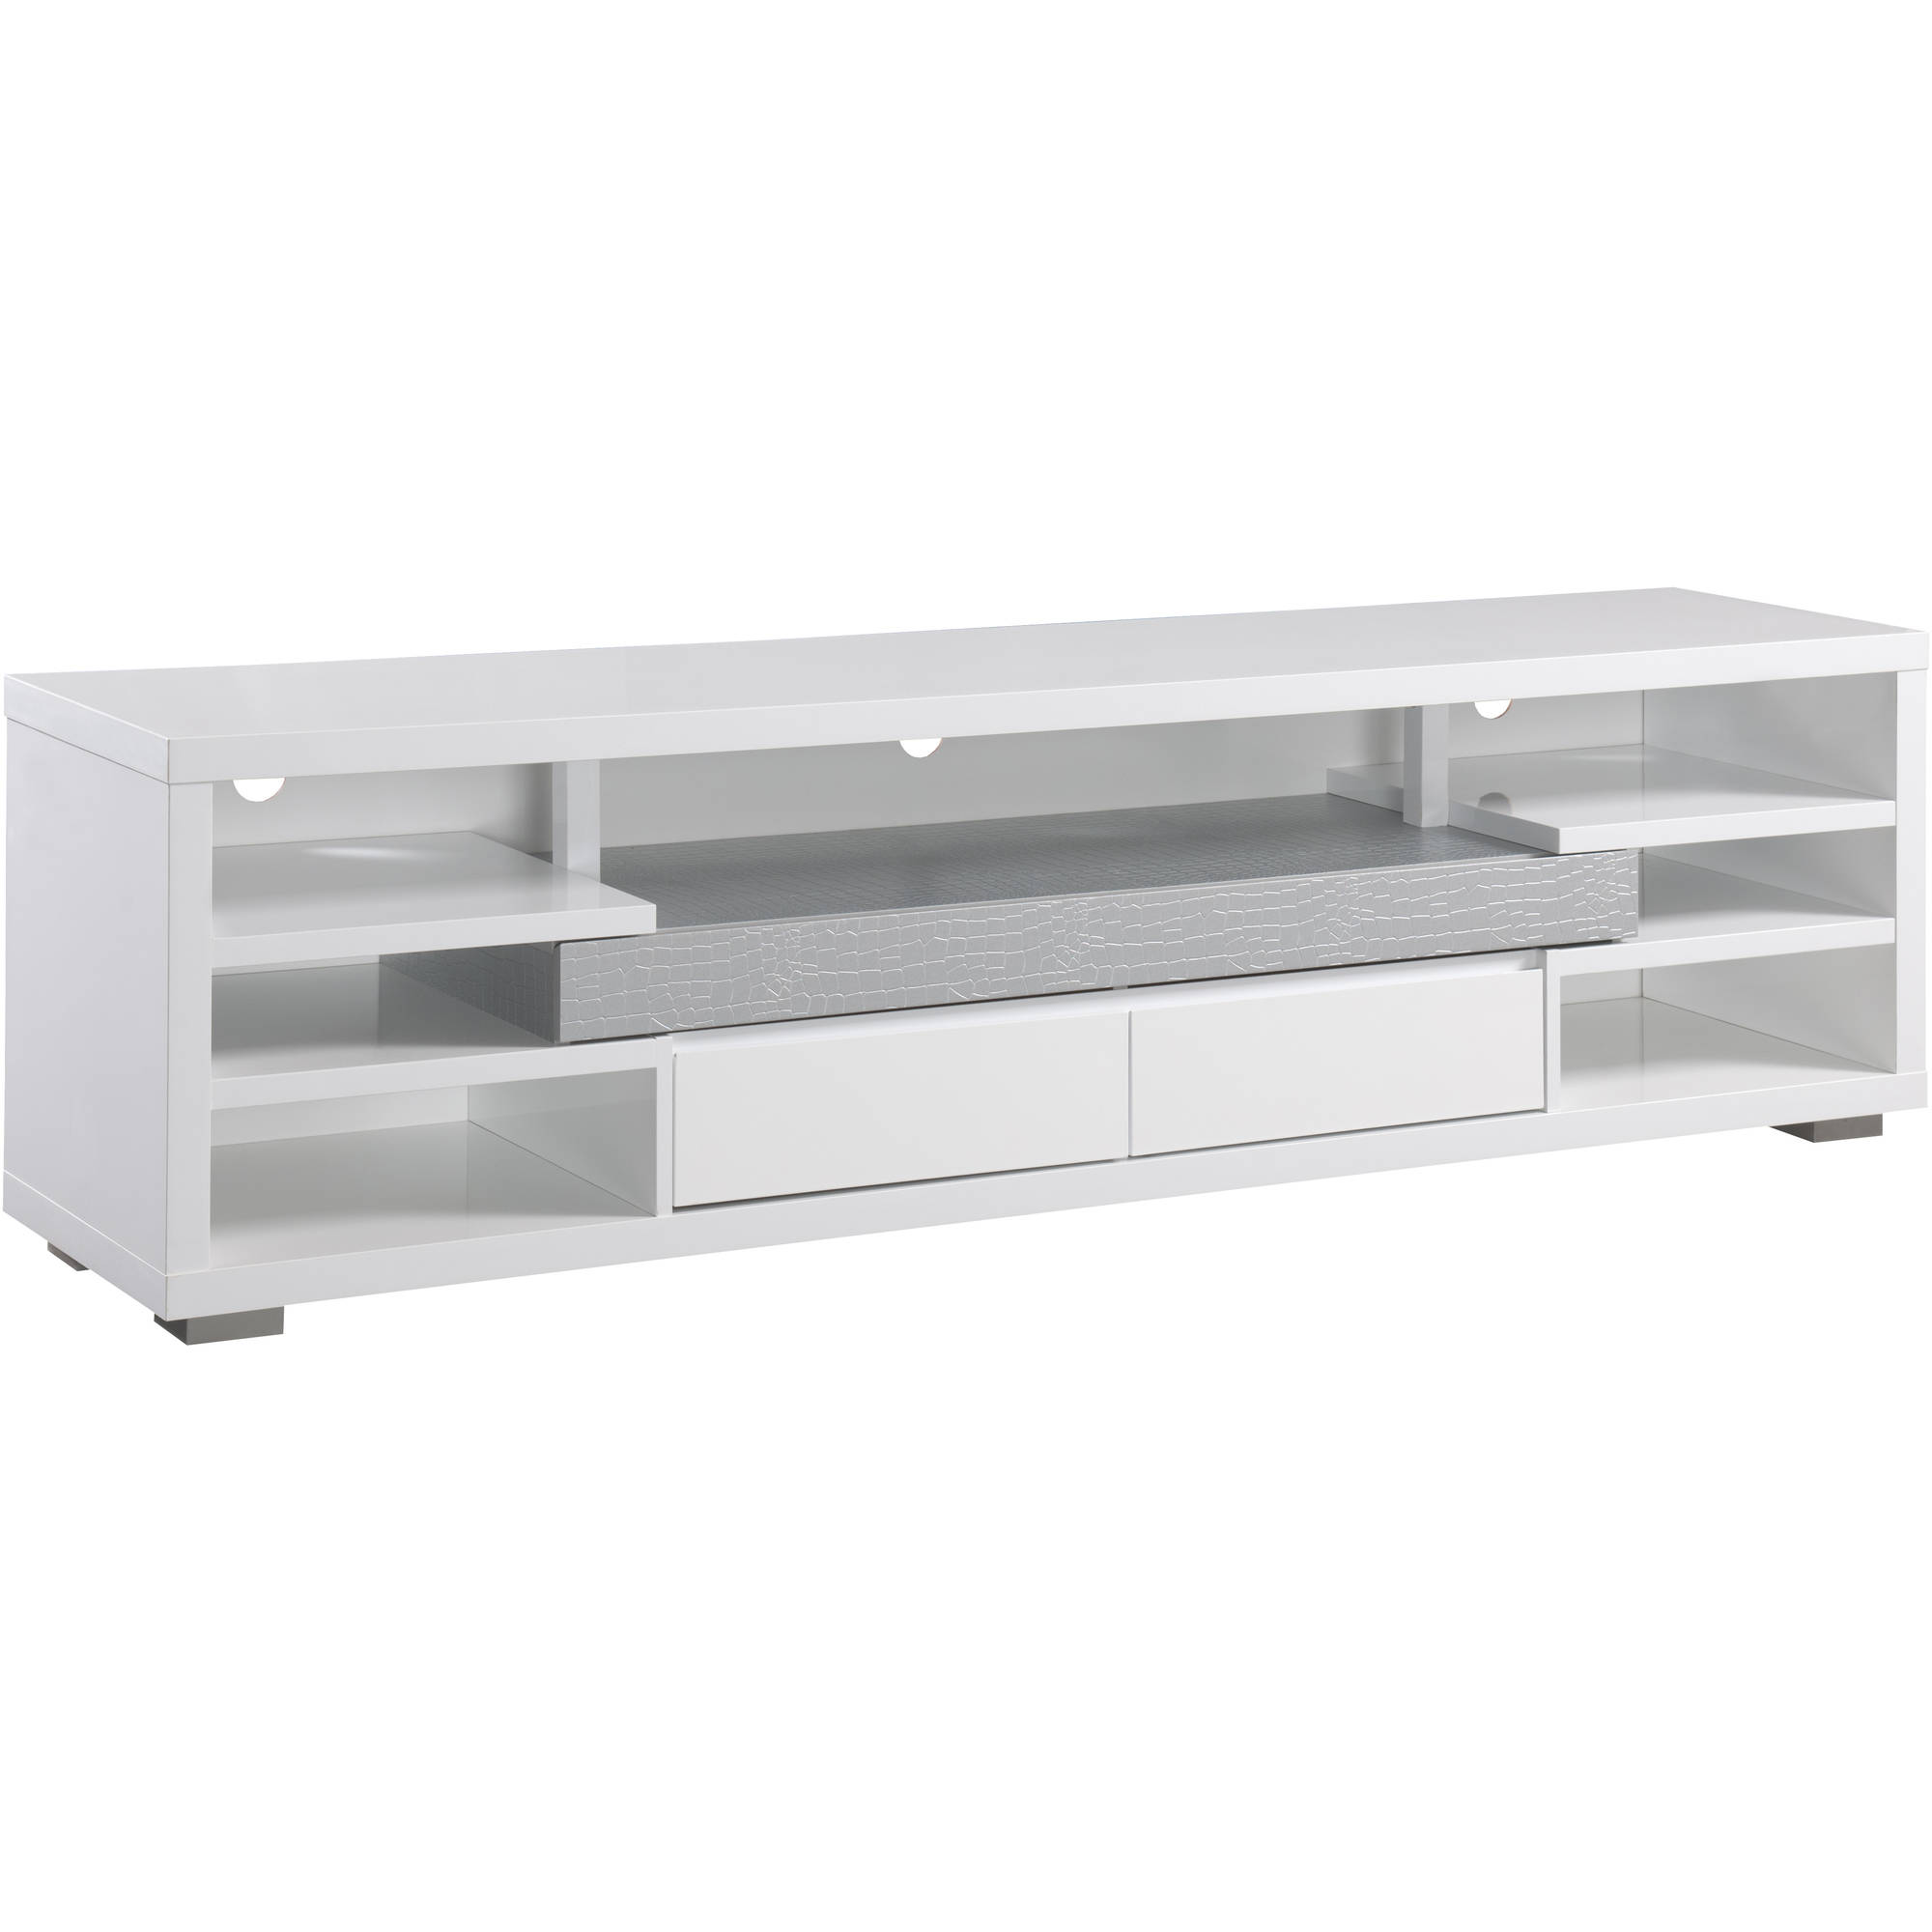 Furniture Of America Phillippe 70 Inch Tv Stand White Silver